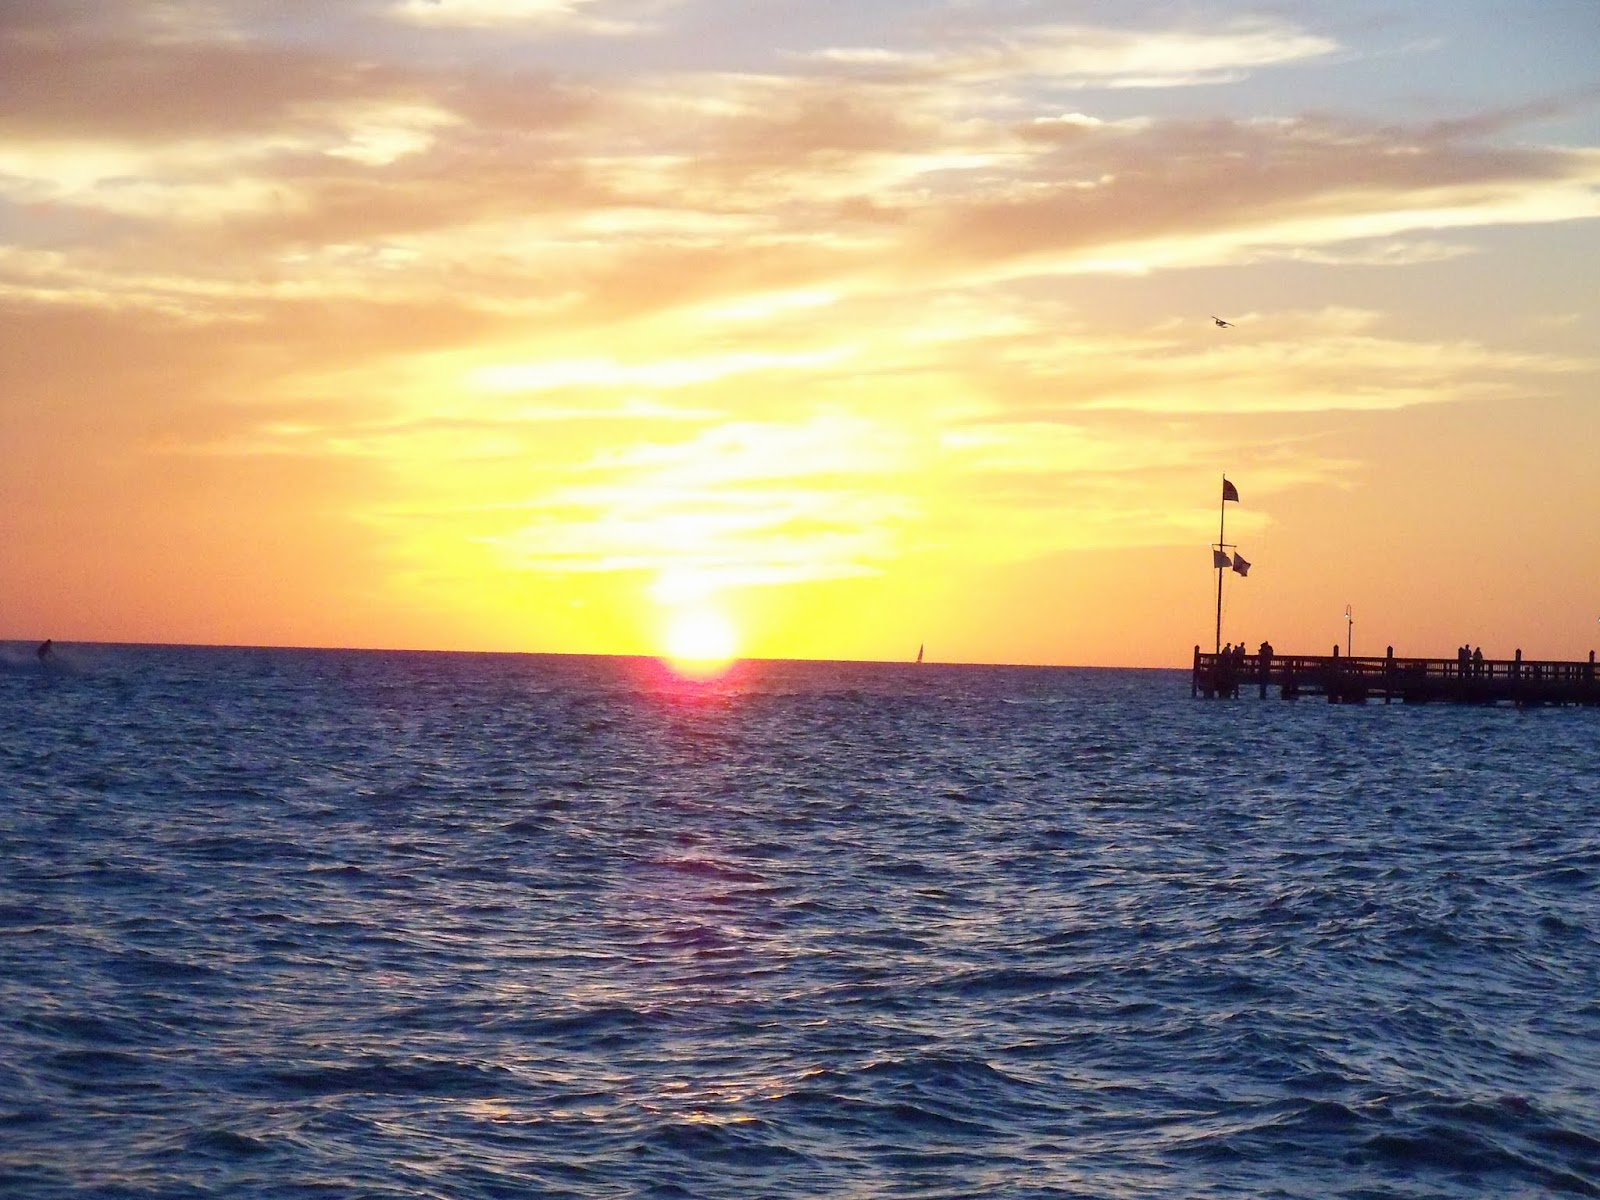 Key West Vacation - 116_5600.JPG